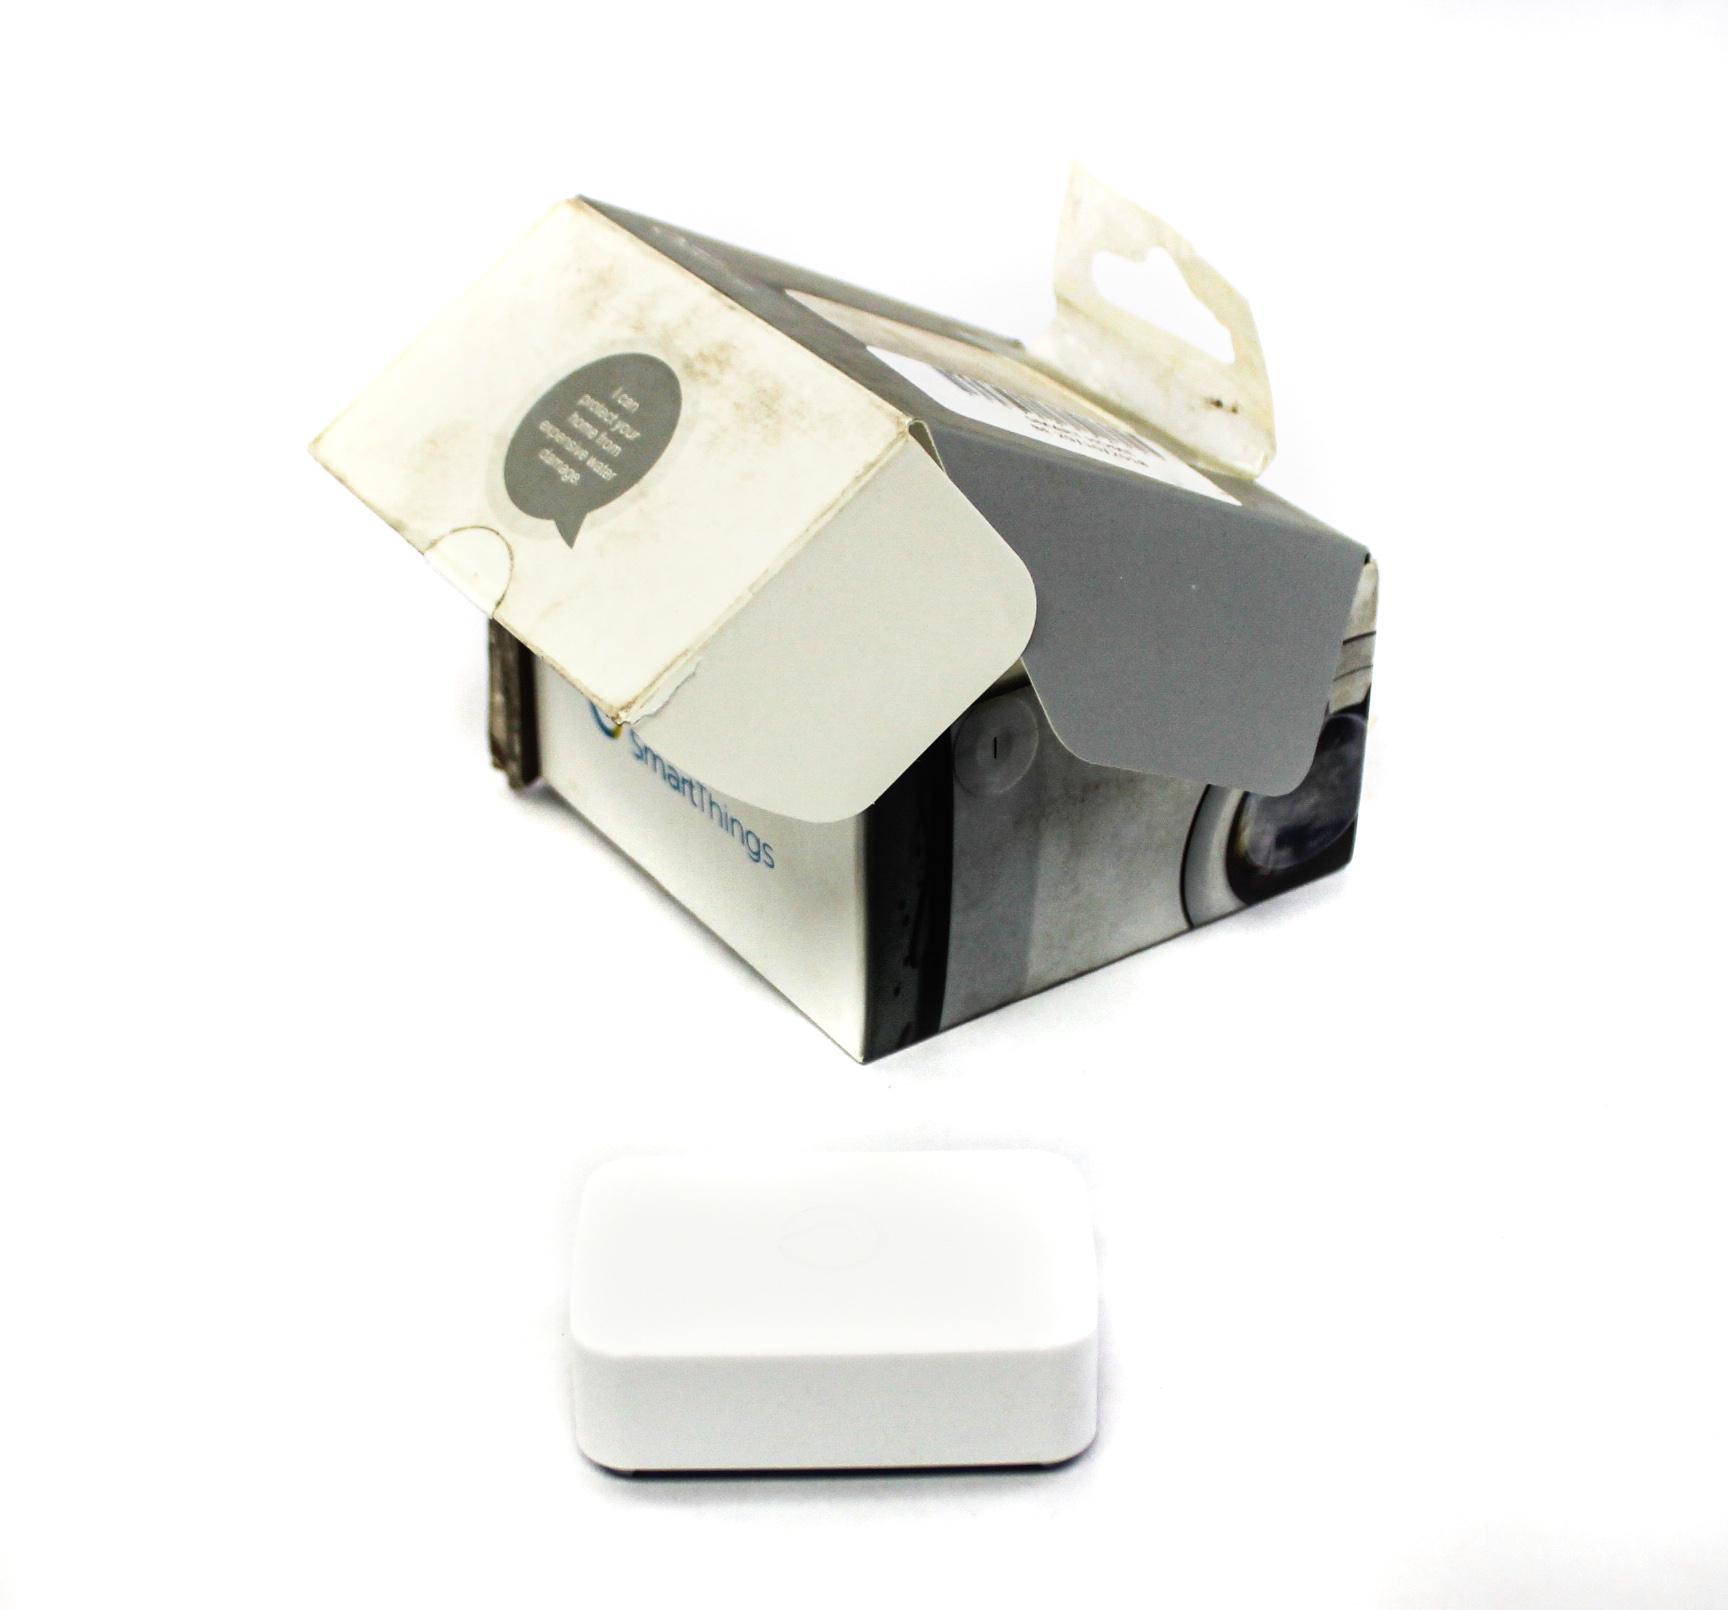 Samsung SmartThings SmartSense Moisture sensor